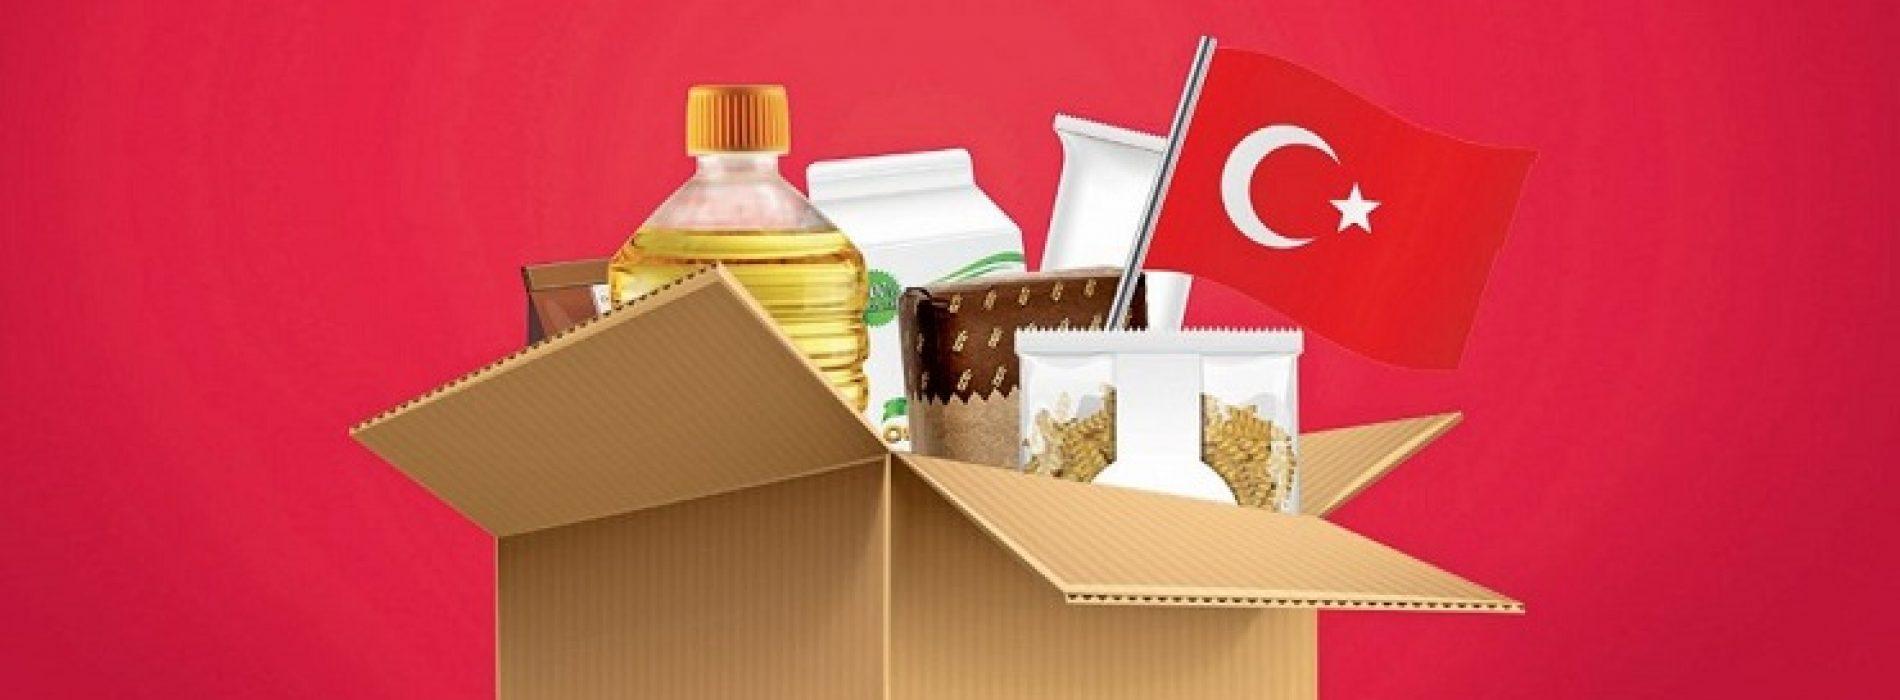 Consumption Habits Of Nationalist Consumers